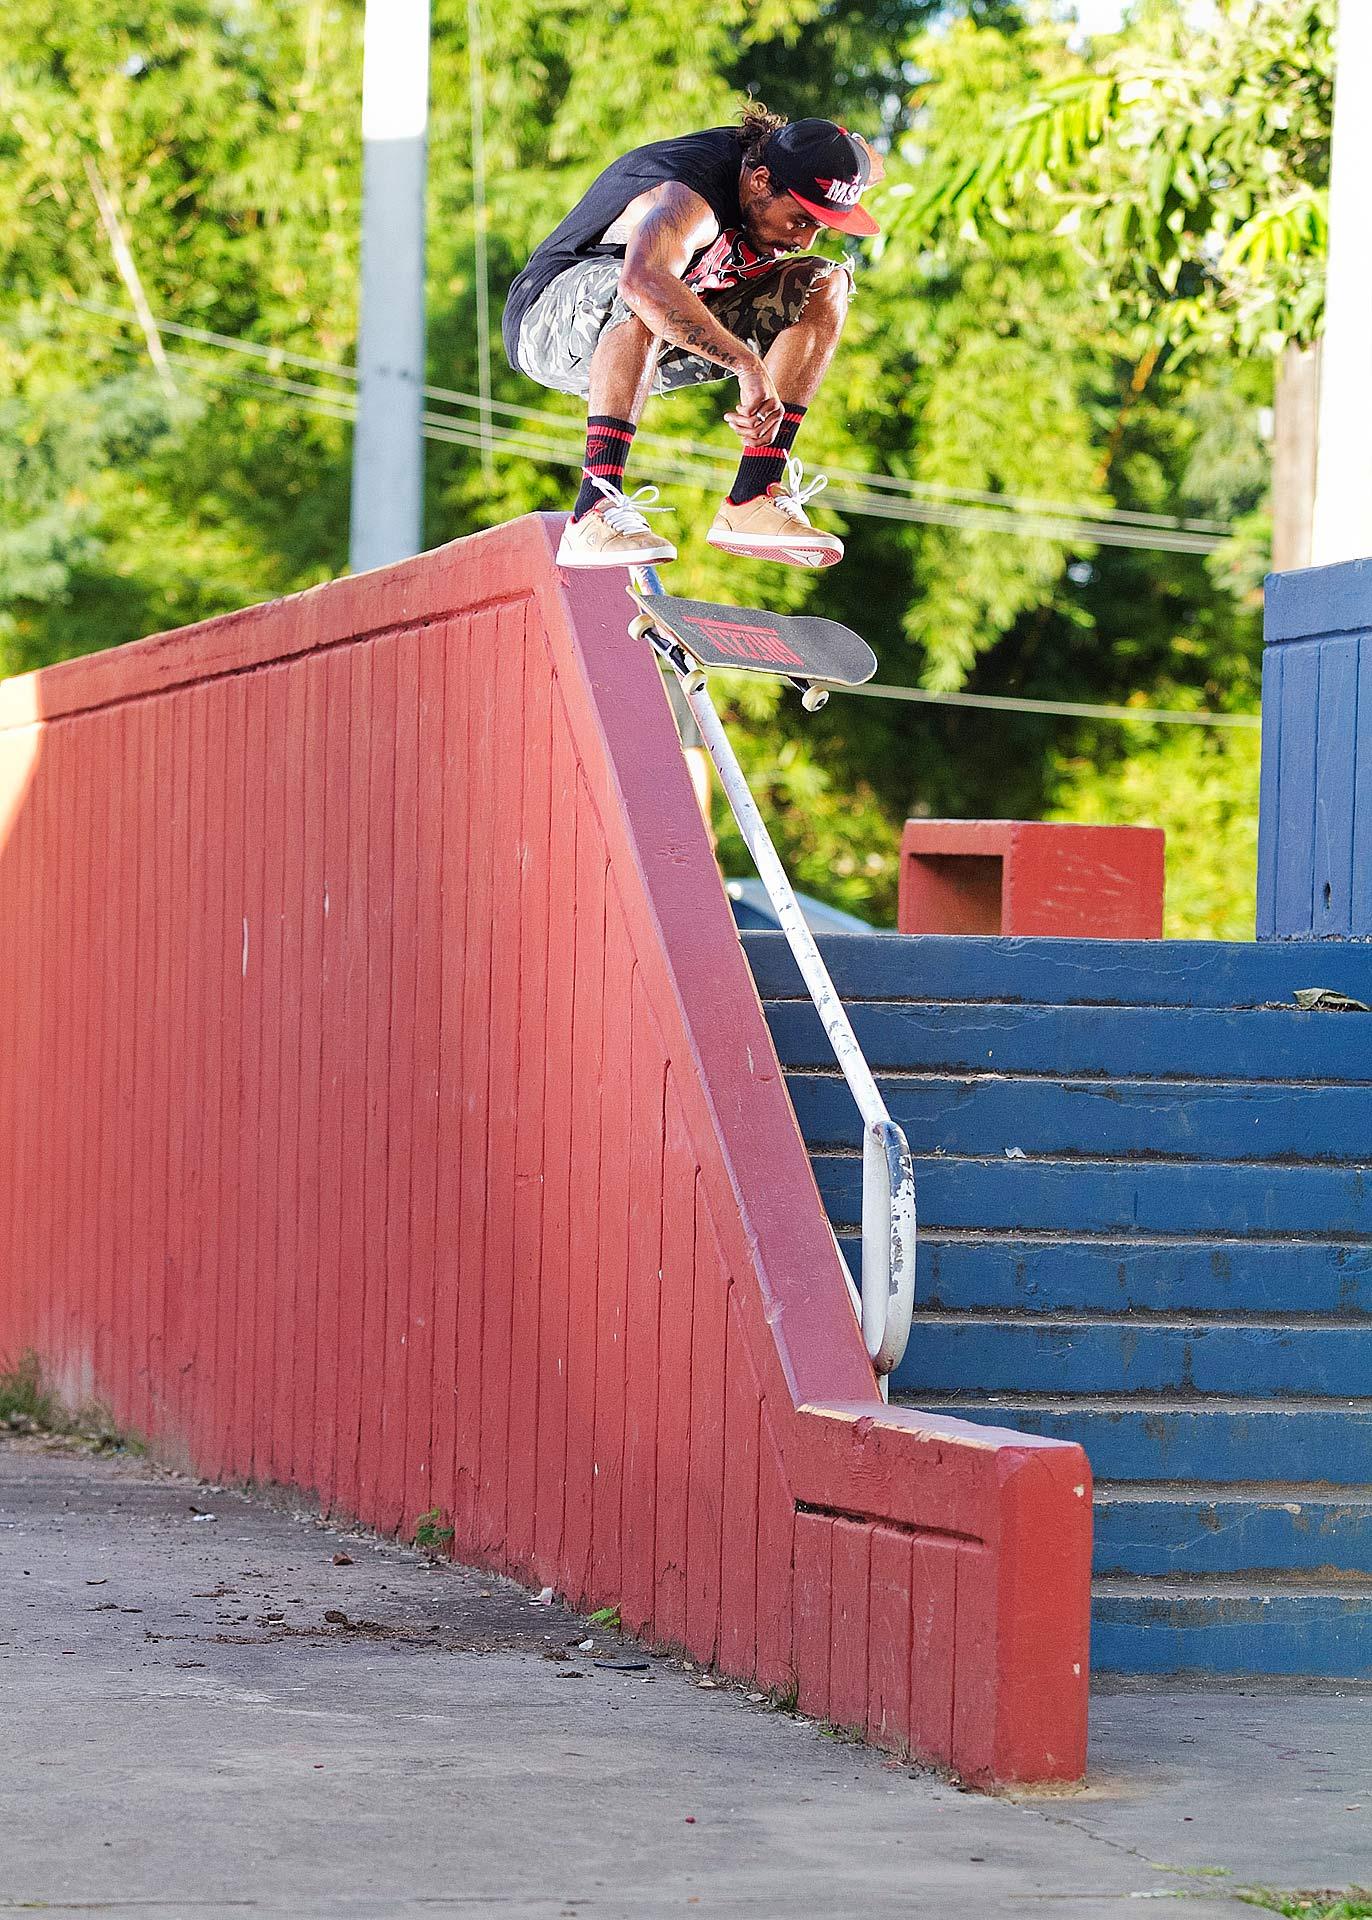 Manny Santiago, Kickflip